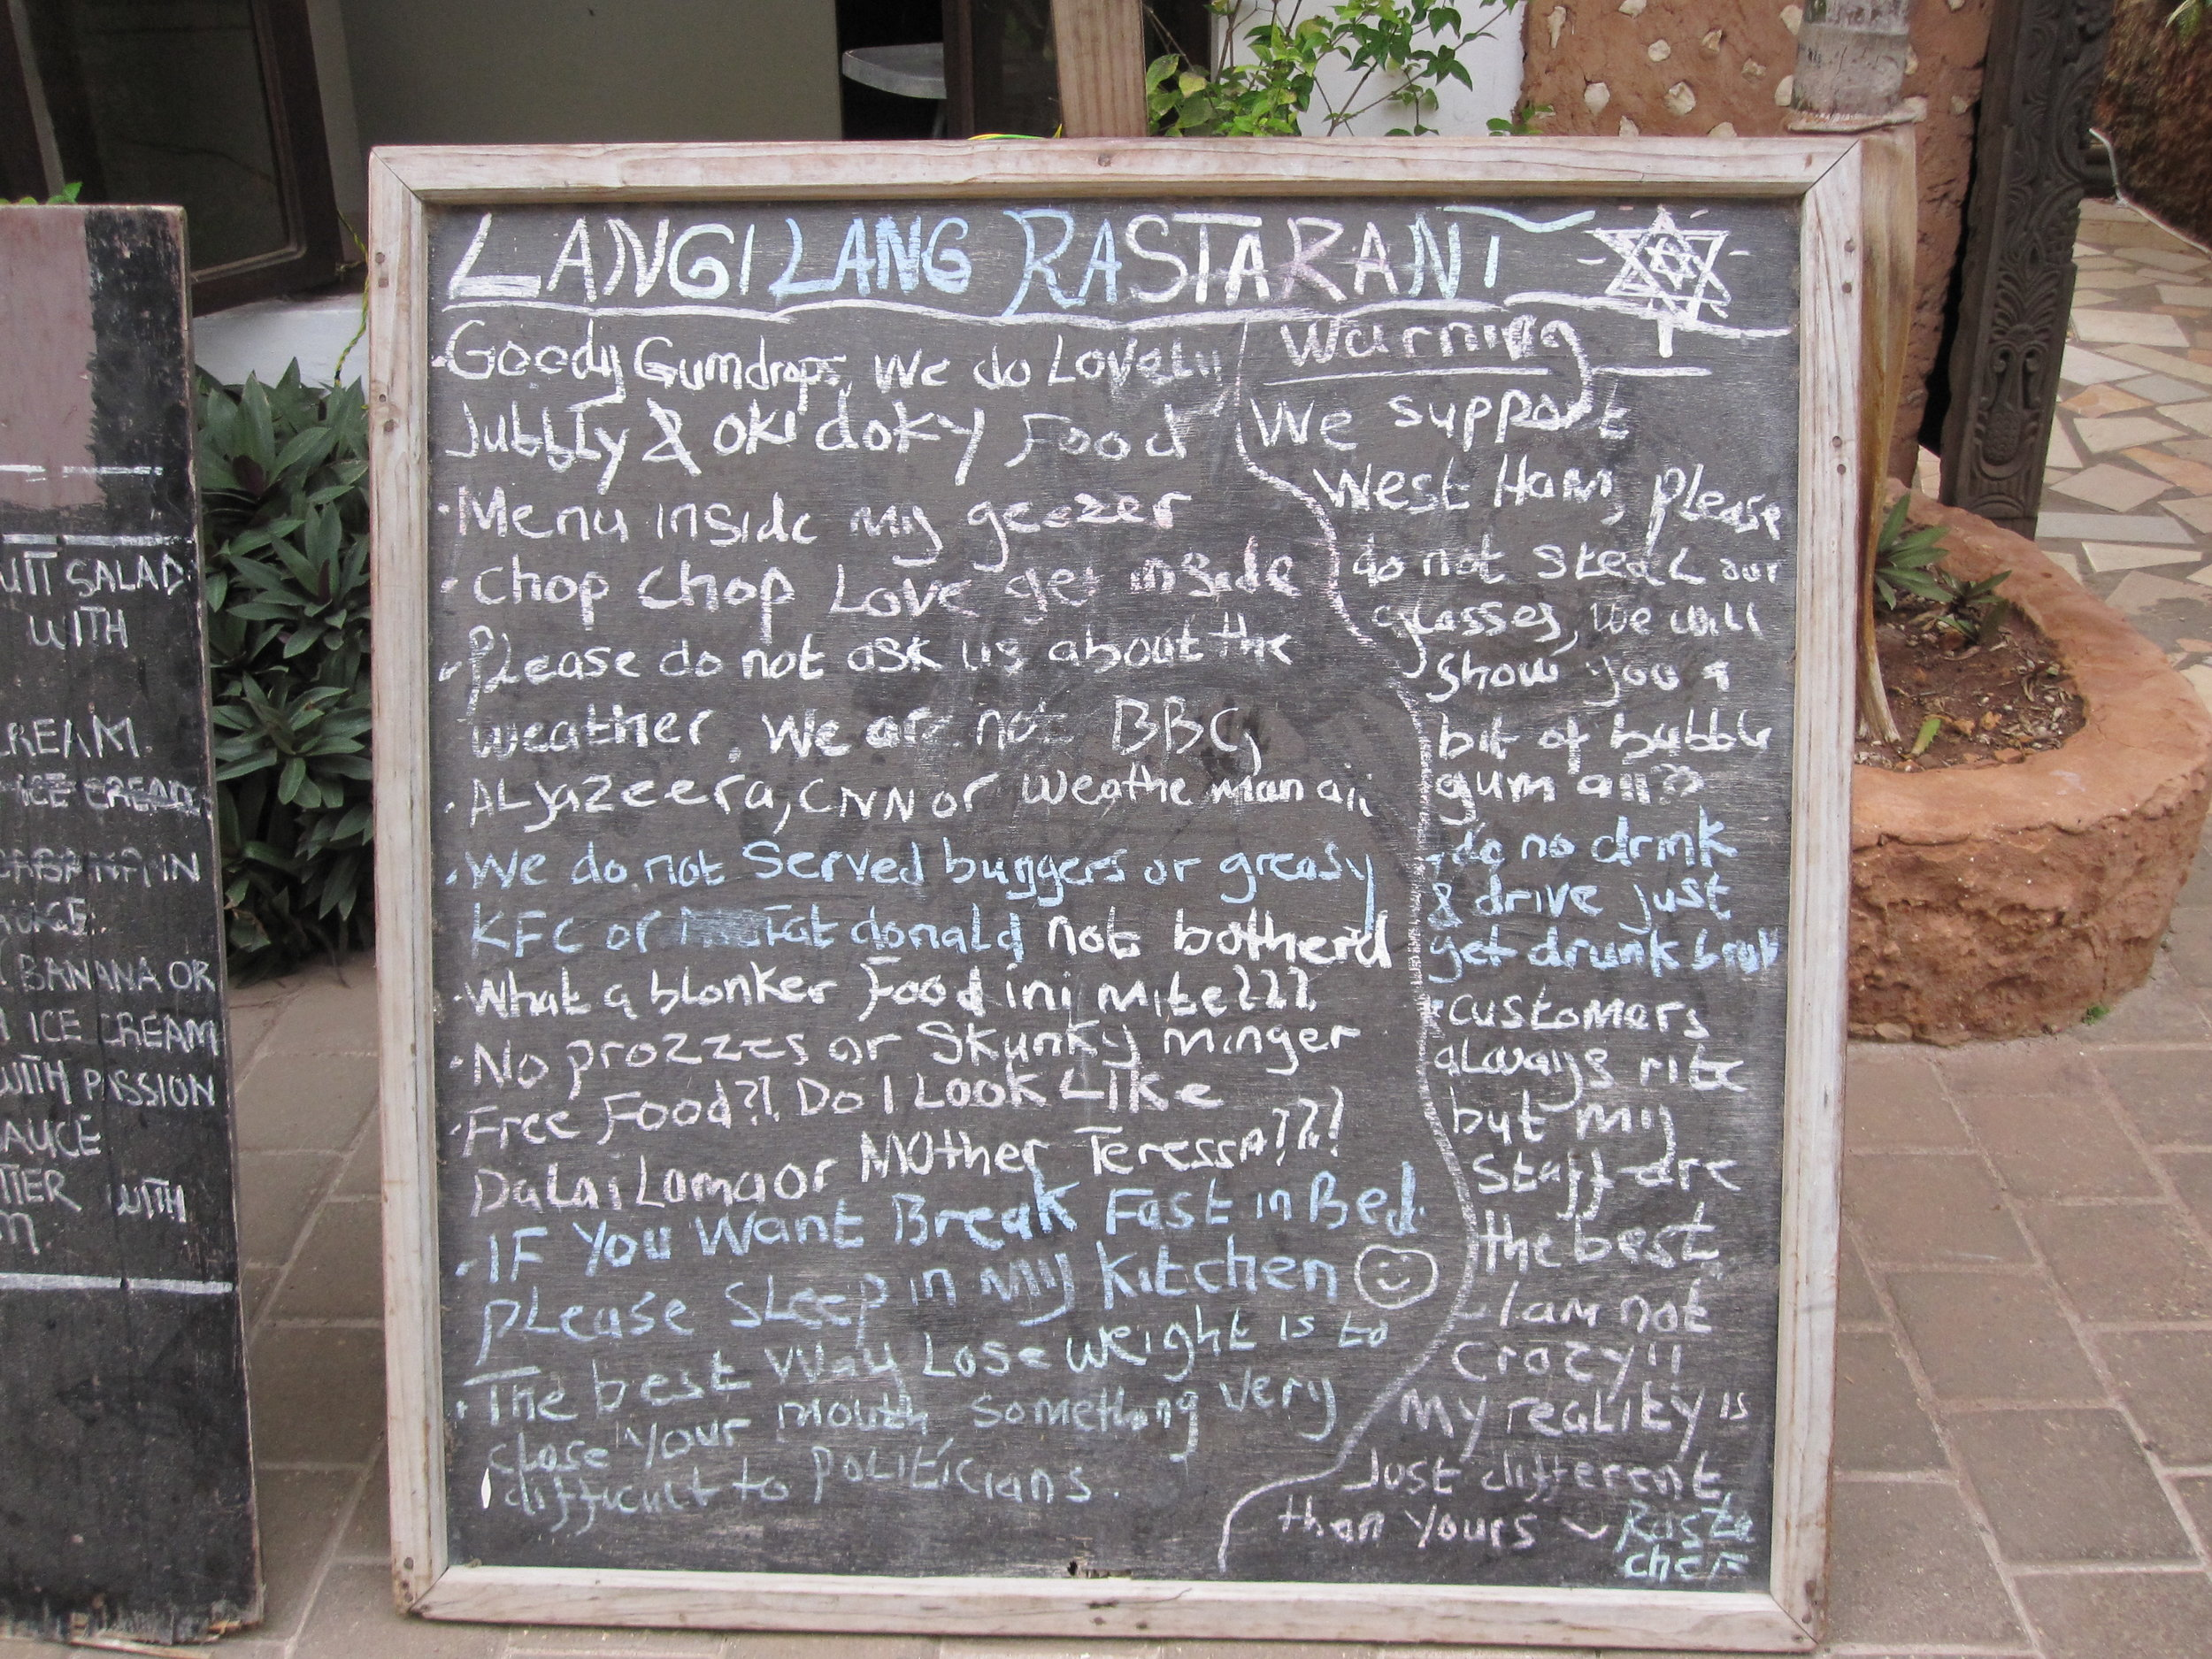 Funny sign at Langi Lang Restaurant in Zanzibar